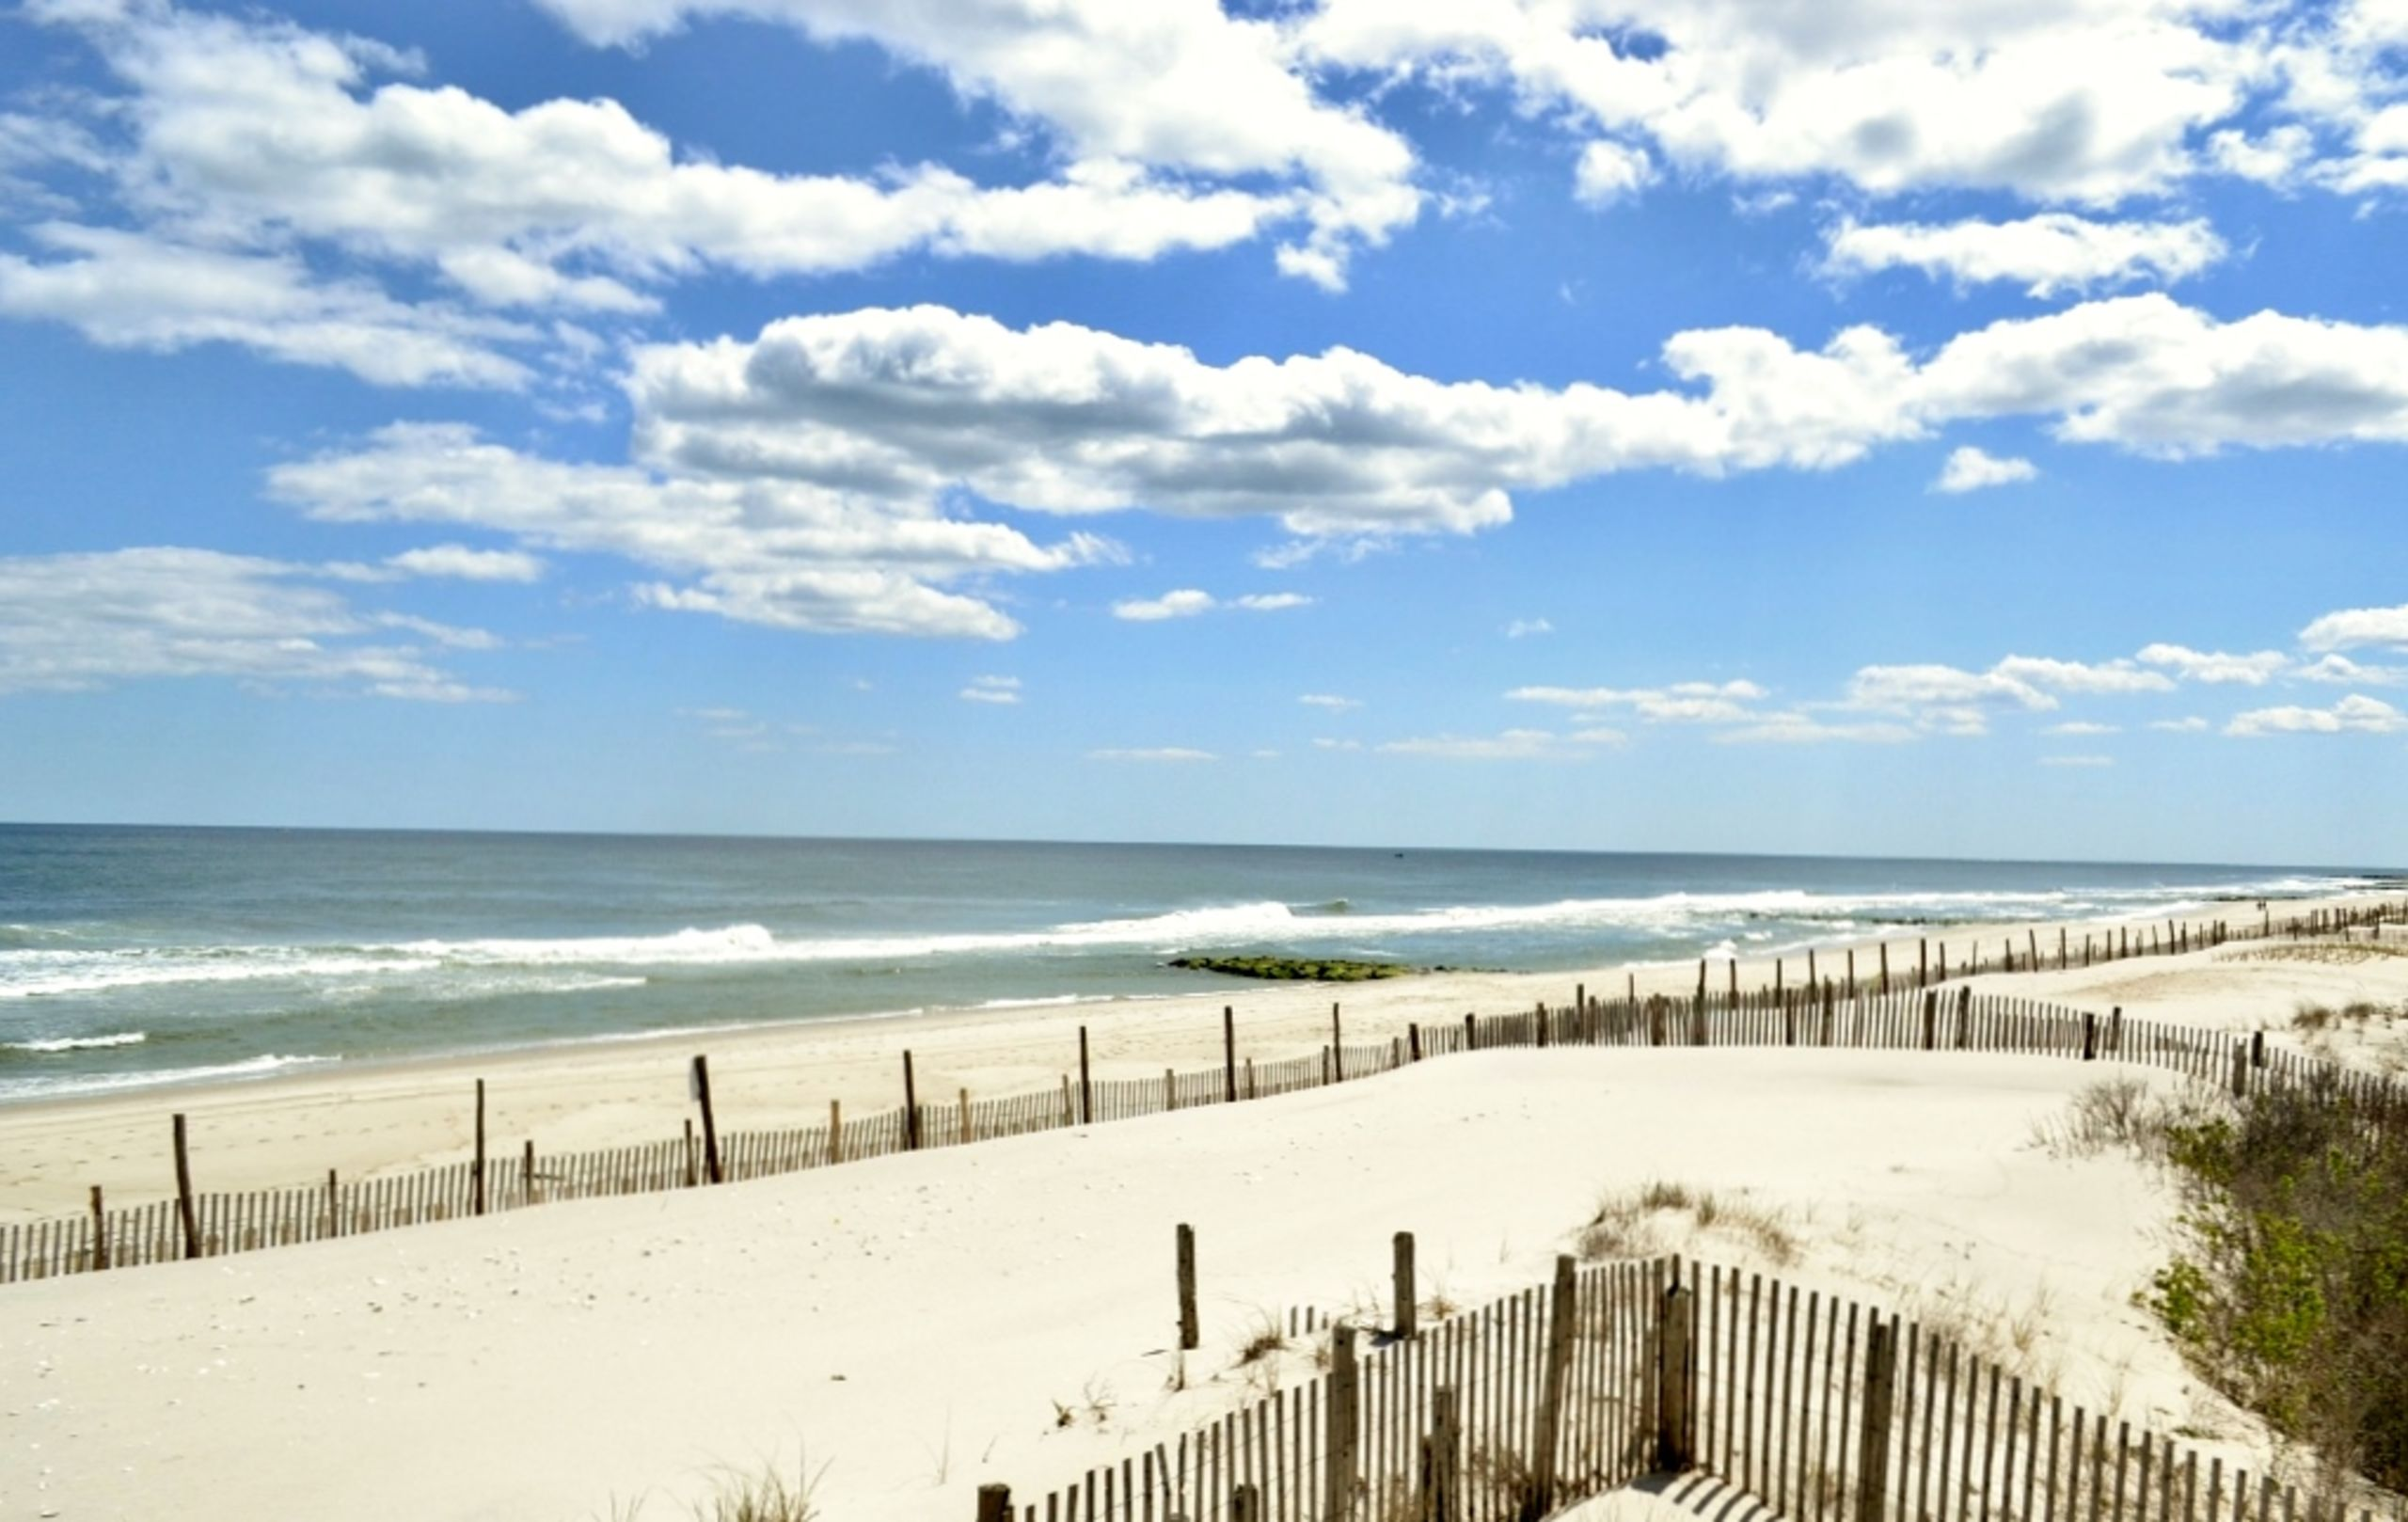 Where the white sands meet the blue sea under powder puff clouds